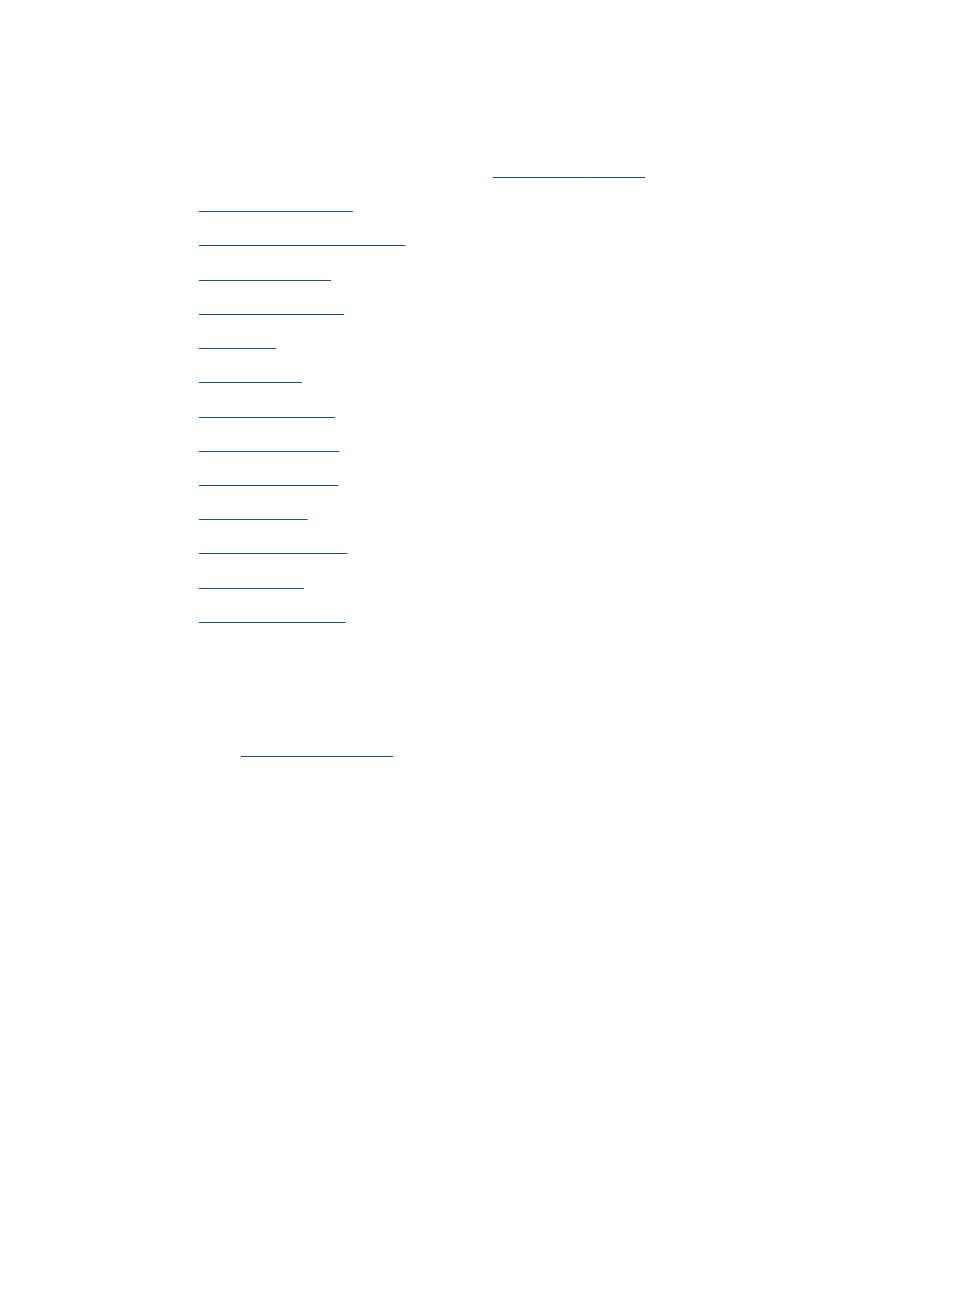 Hp Deskjet 2540 Series User Manual - sharetree